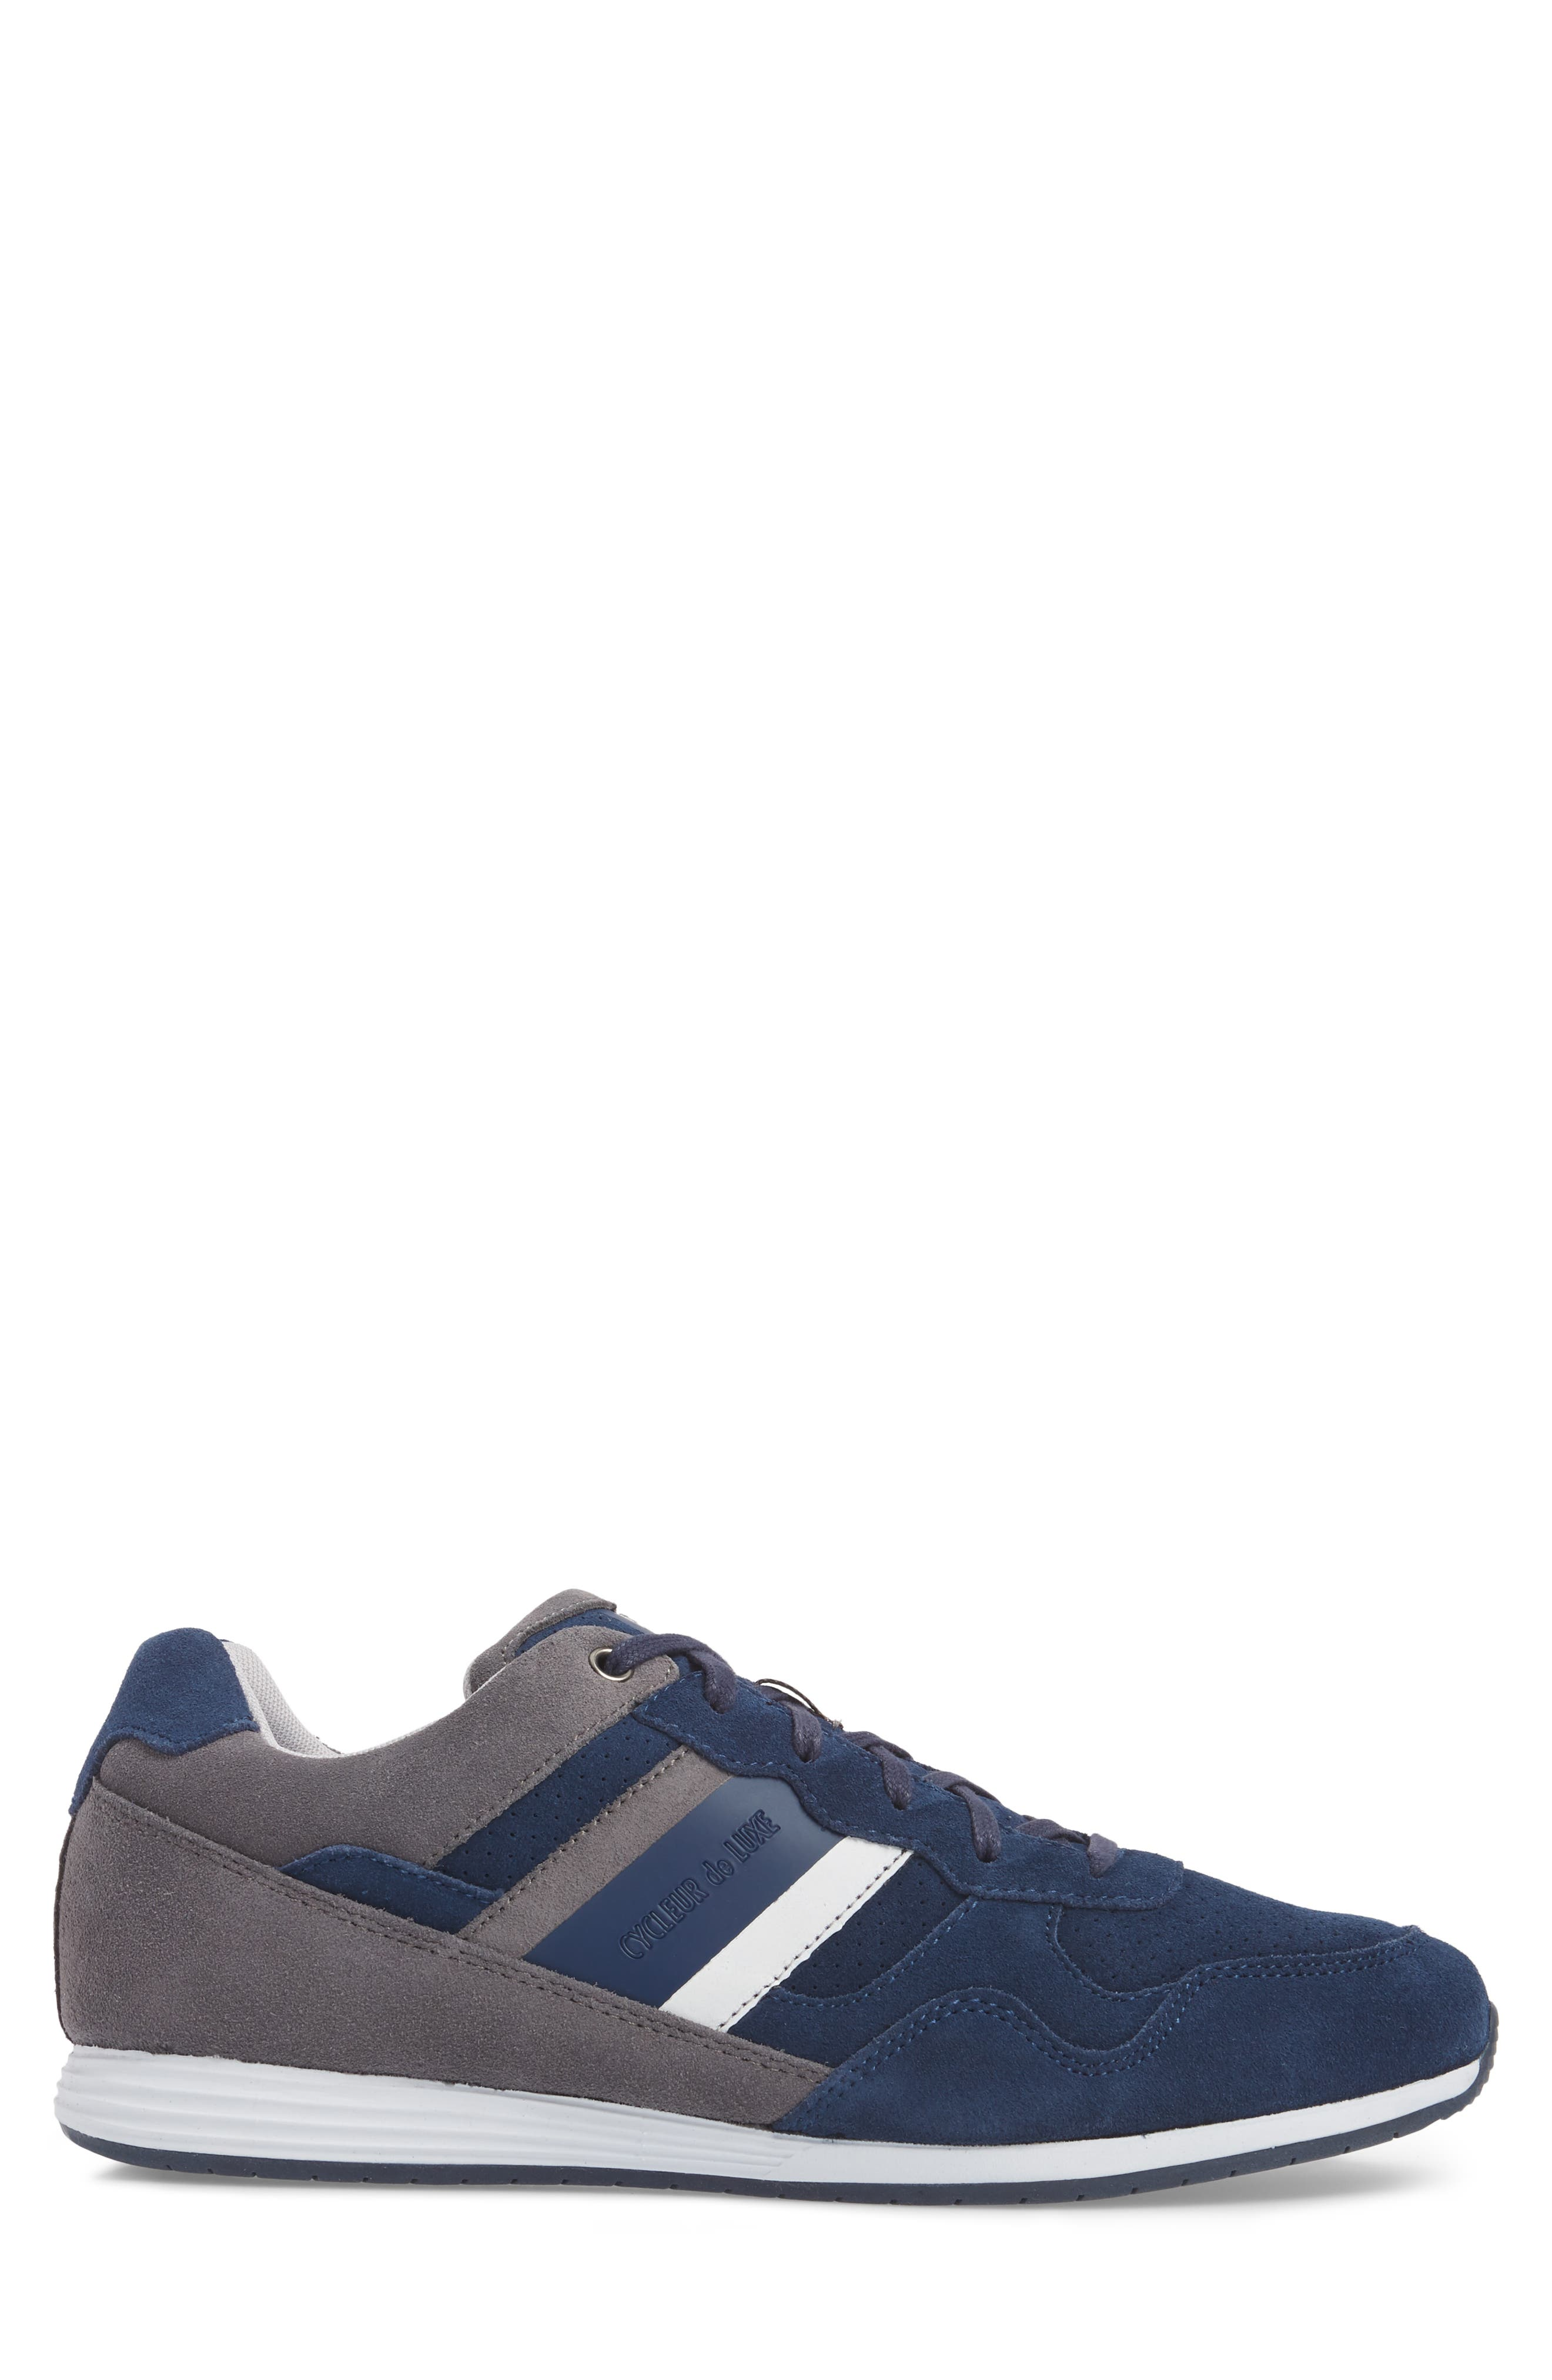 Scarpo Low Top Sneaker,                             Alternate thumbnail 3, color,                             NAVY SUEDE